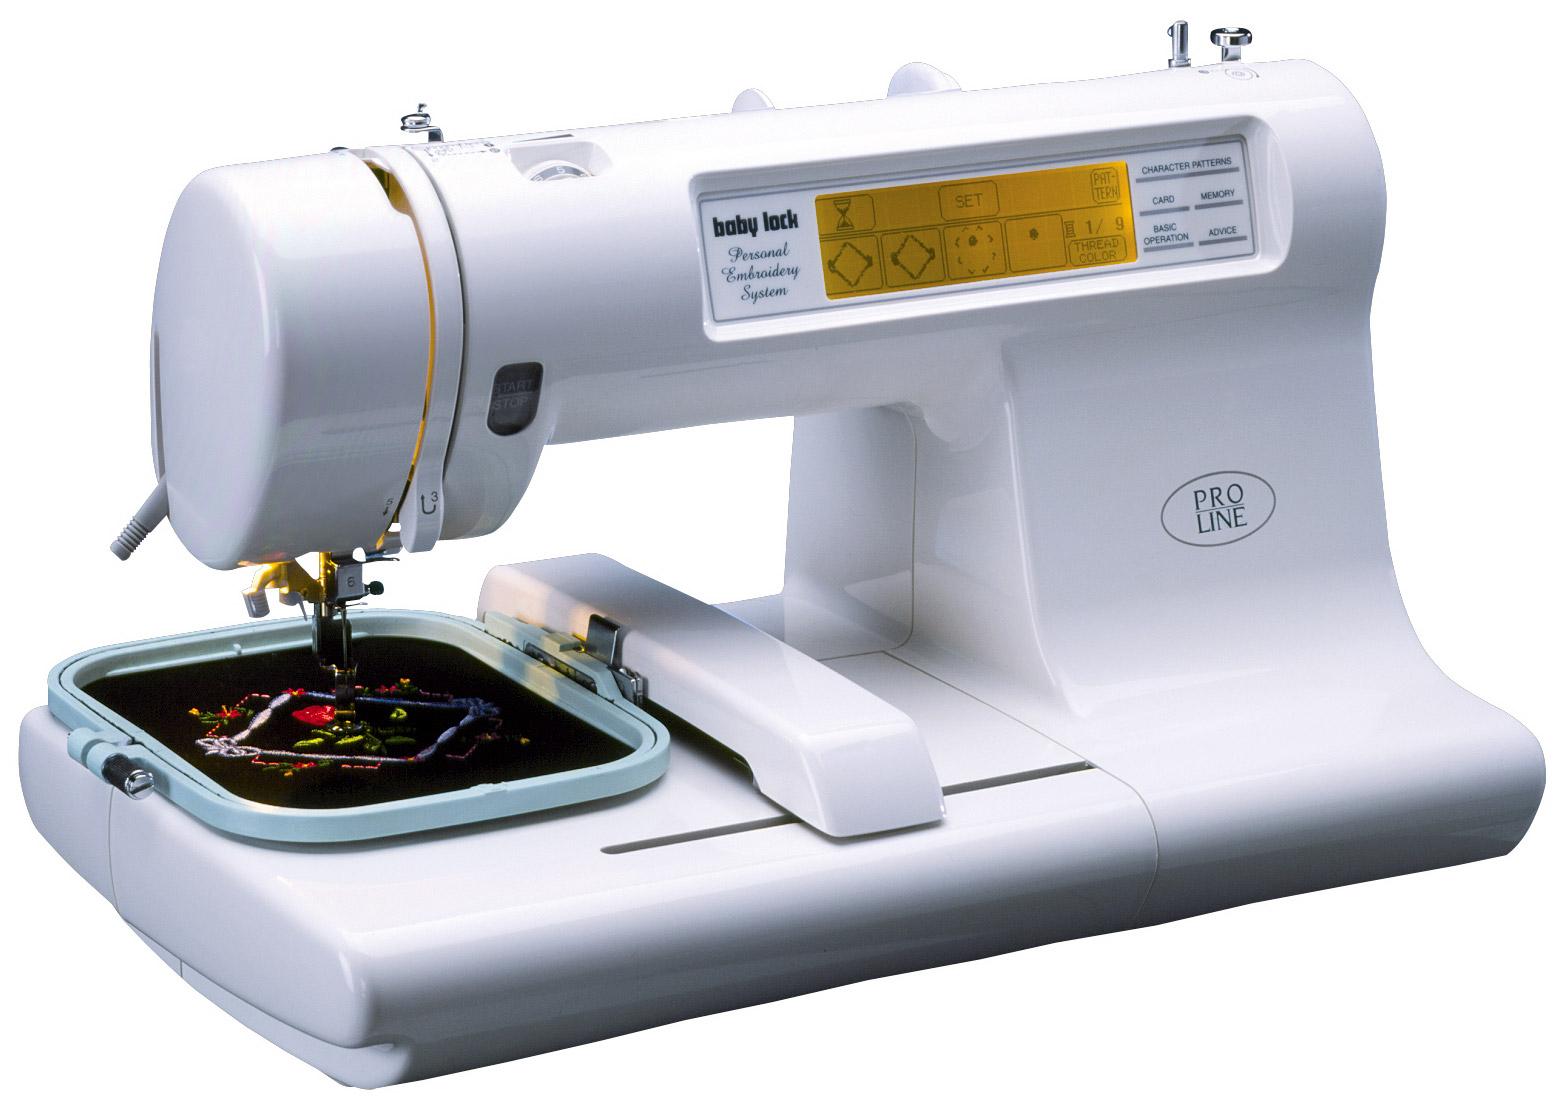 espree babylock embroidery machine